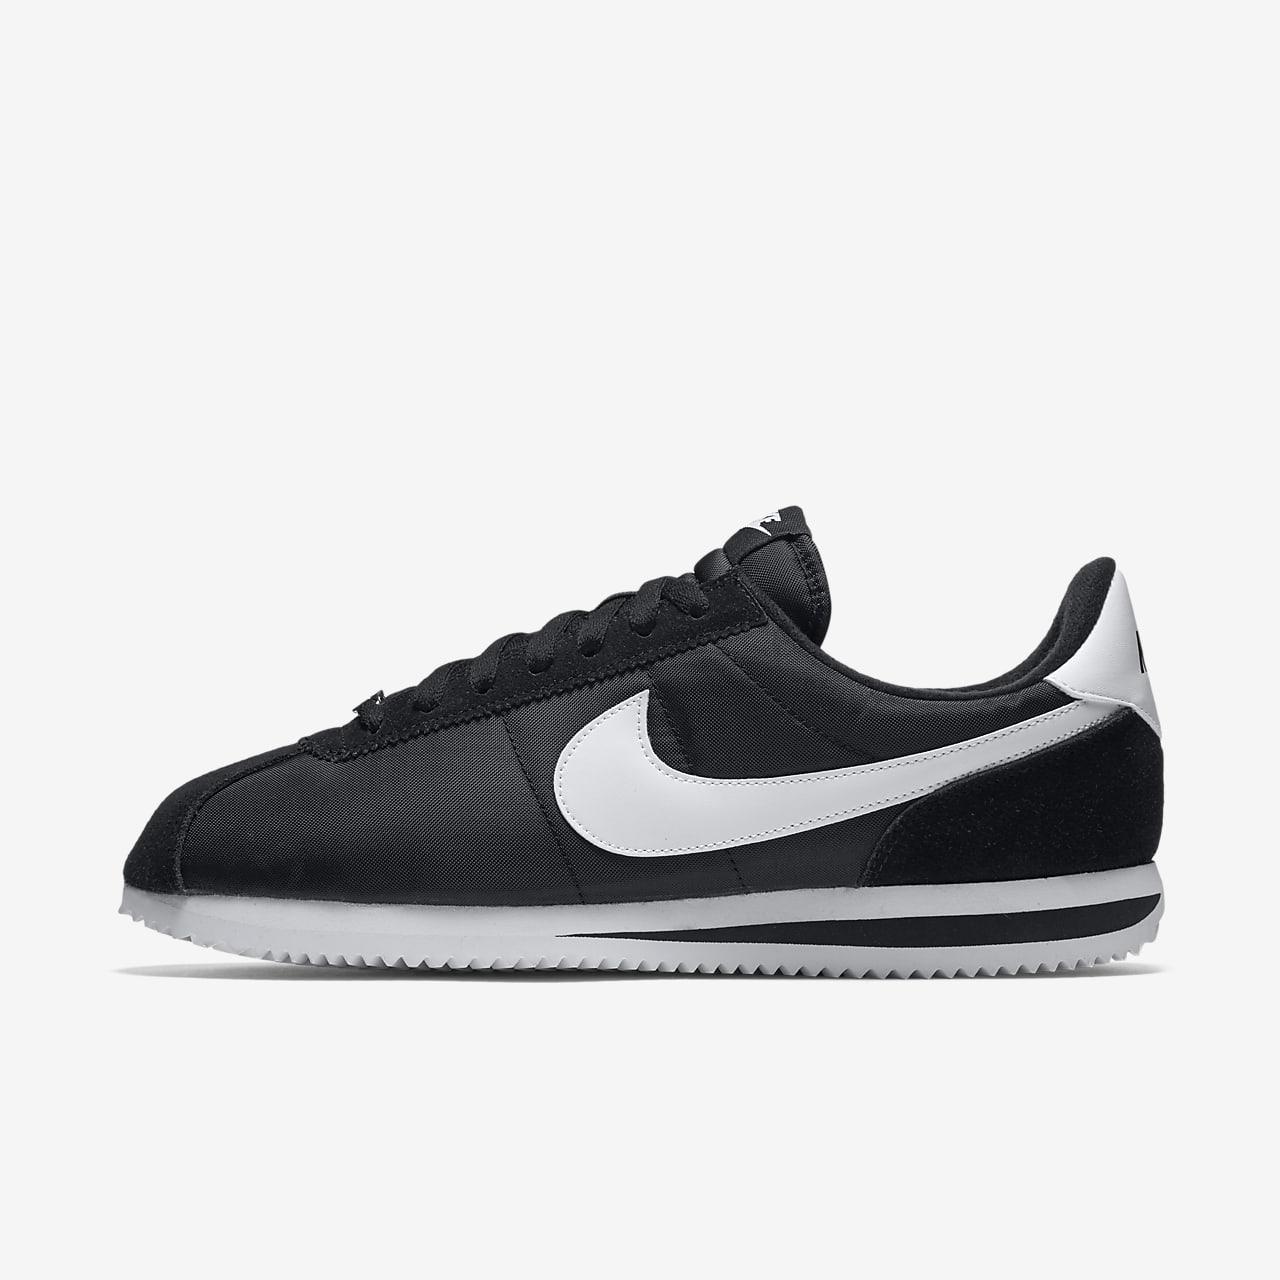 reinado Permanecer de pié verano  nike cortez basic black white Shop Clothing & Shoes Online